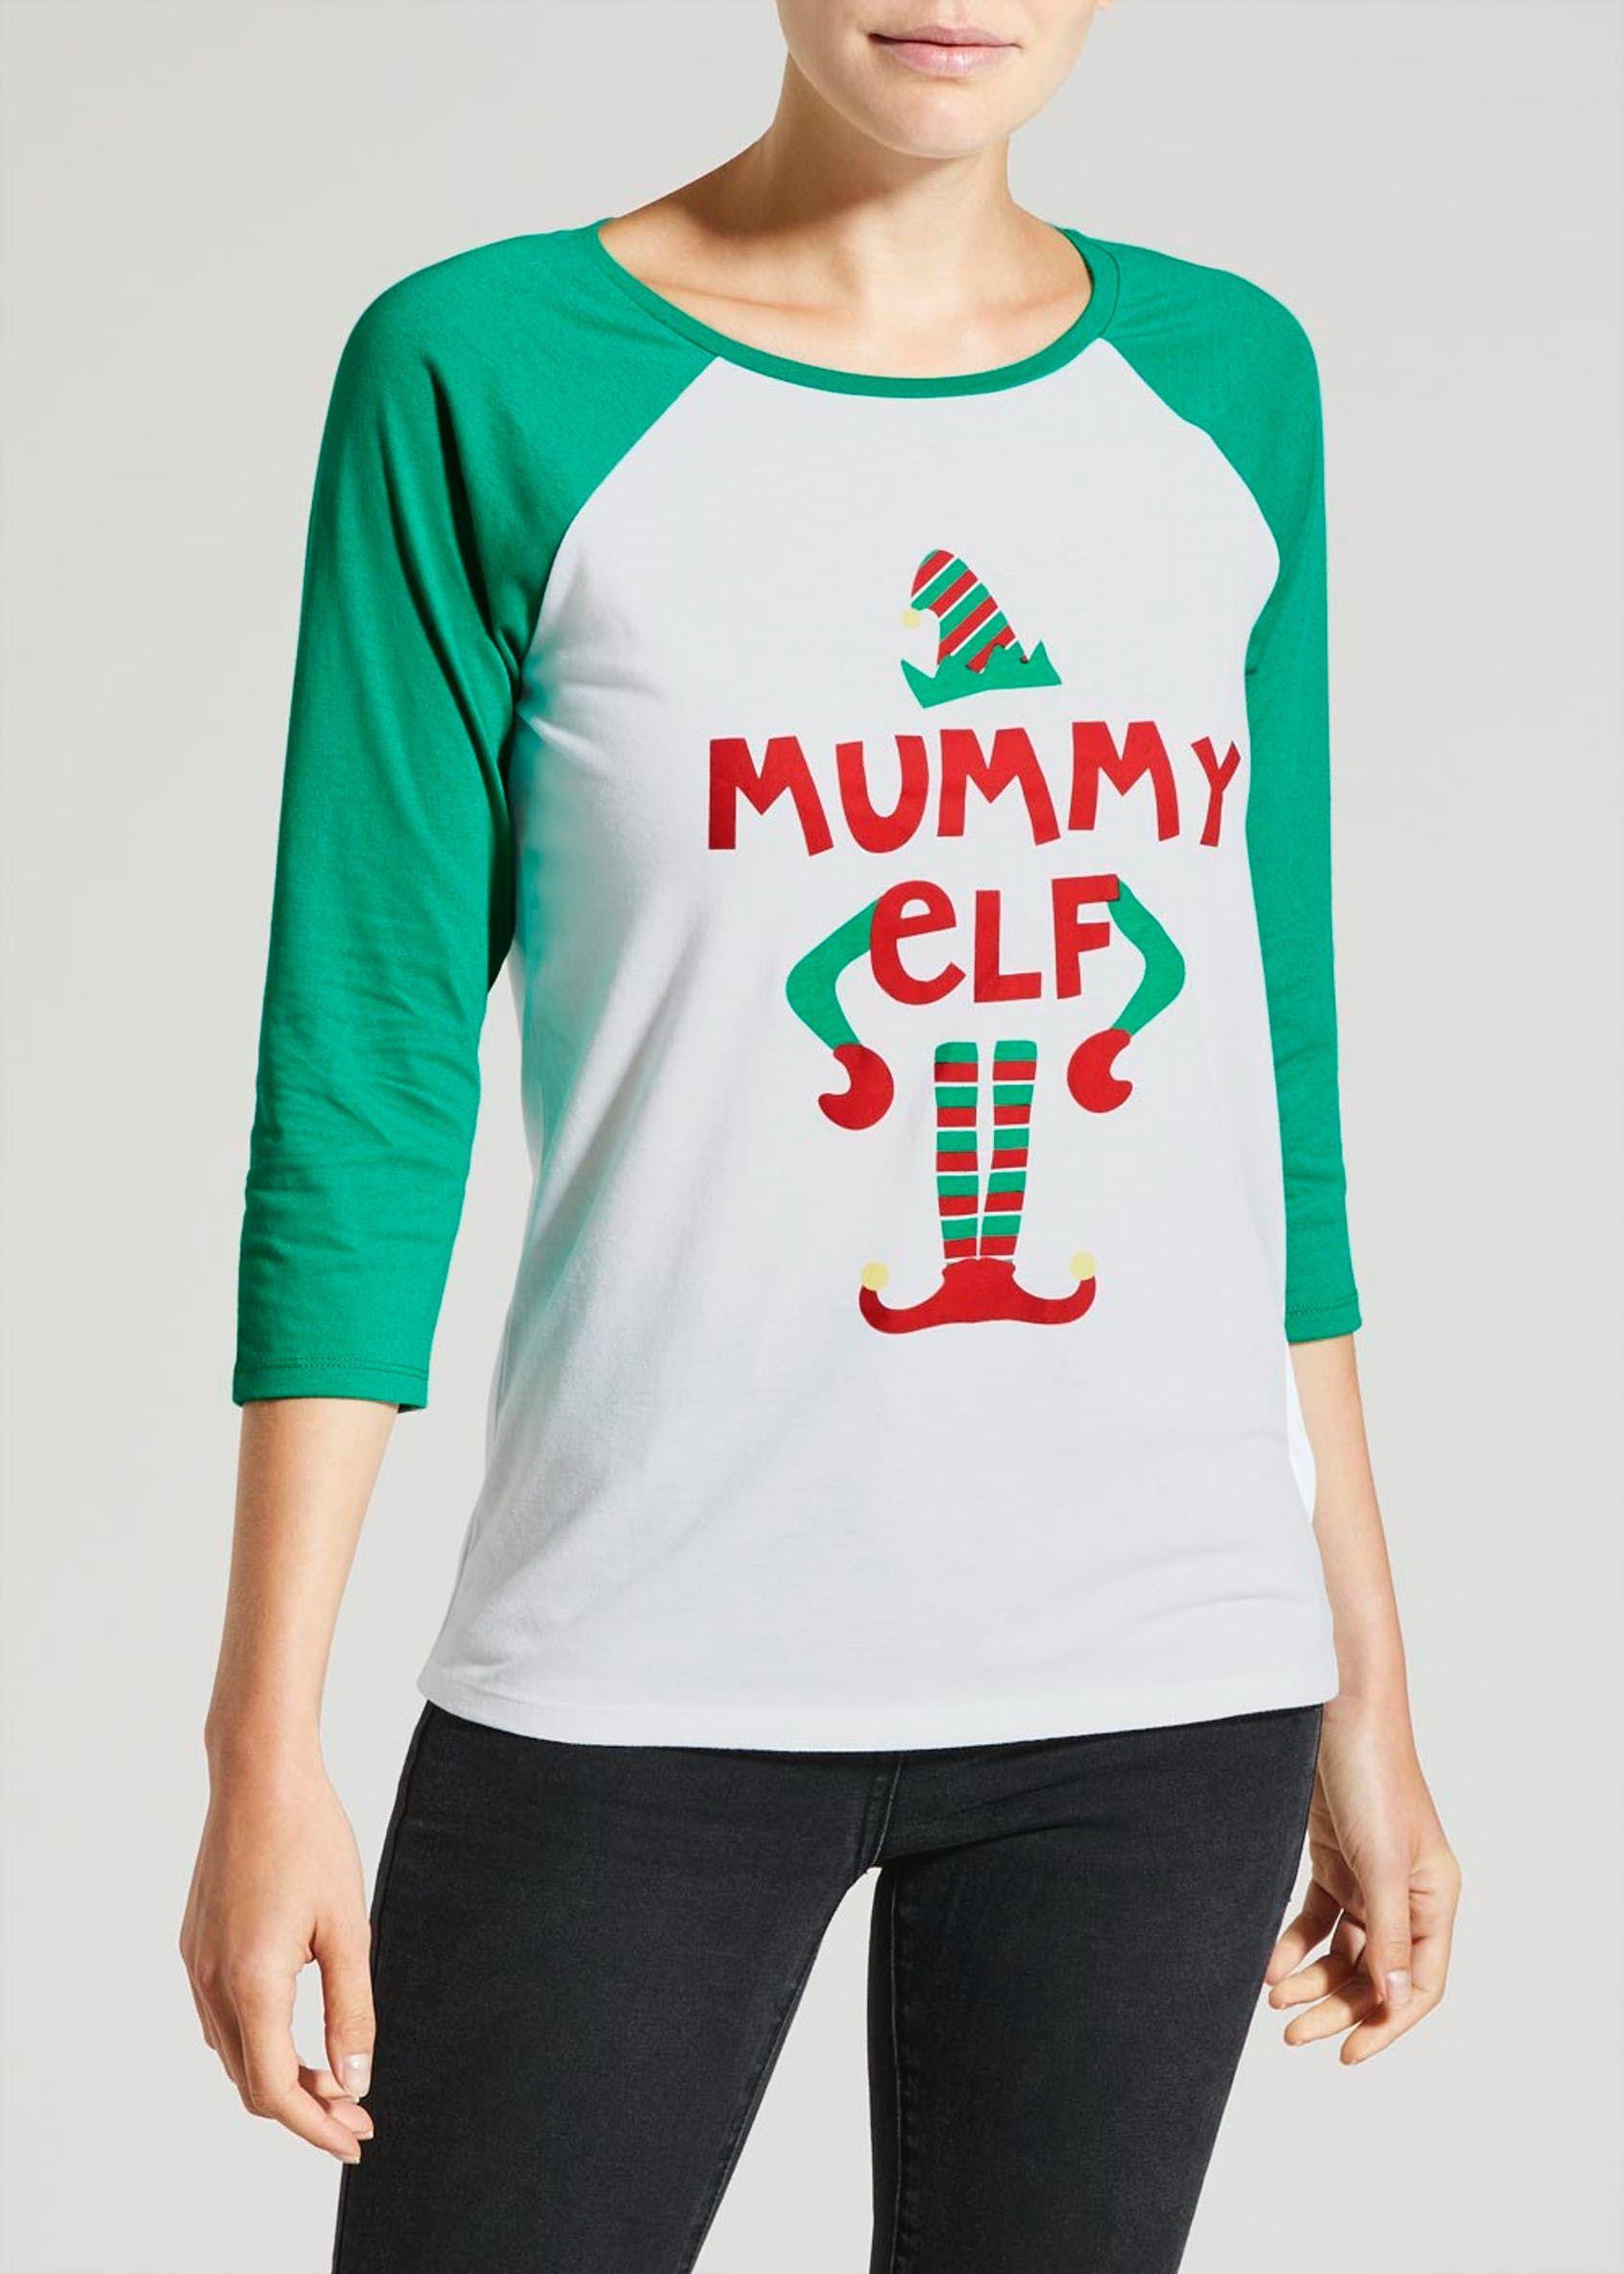 59ce46c897c5 Mummy Elf Christmas T-Shirt | what to wear? | Christmas elf, Shirts ...